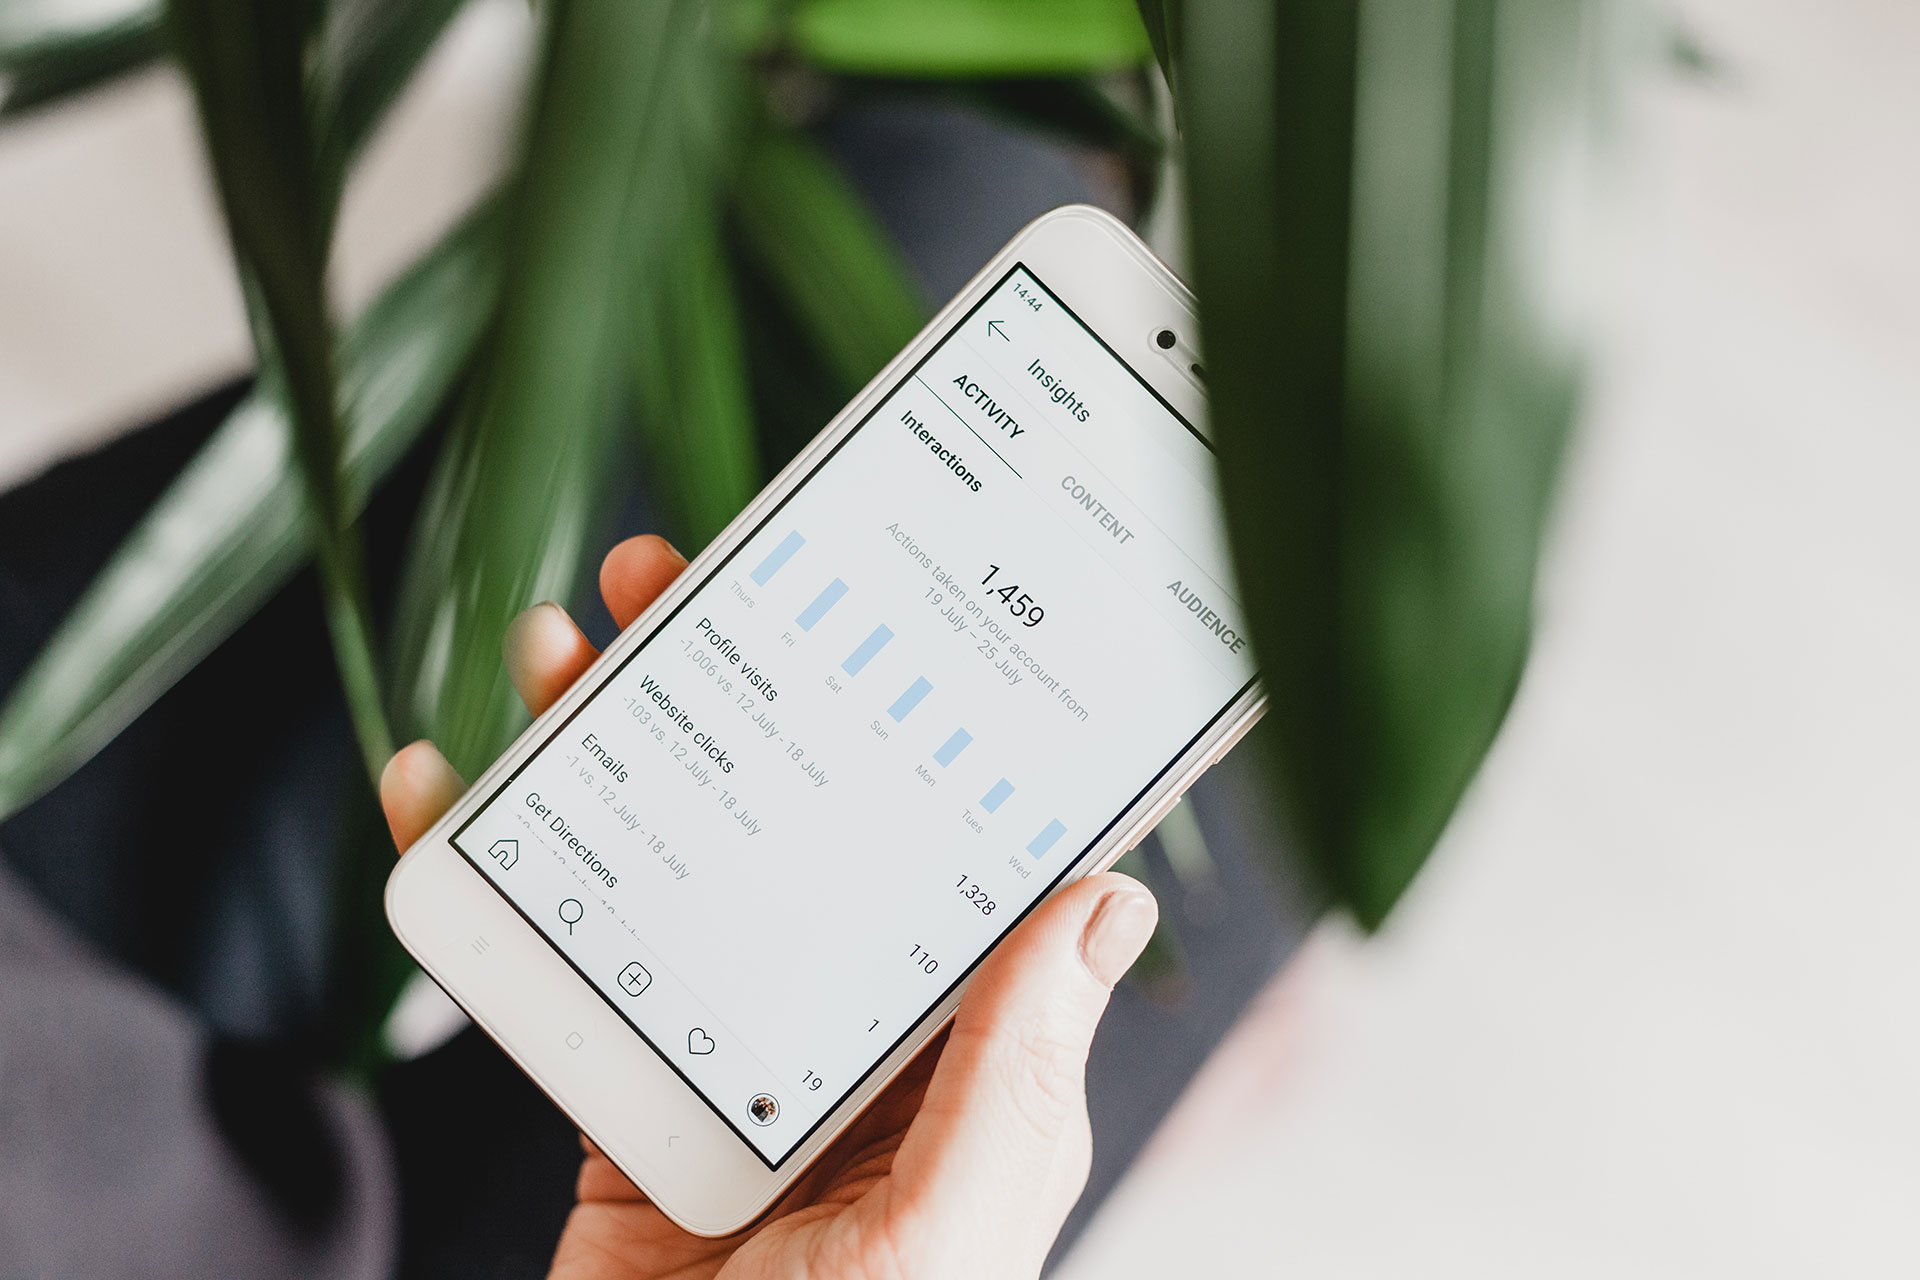 pourquoi utiliser instagram pour developper ton entreprise